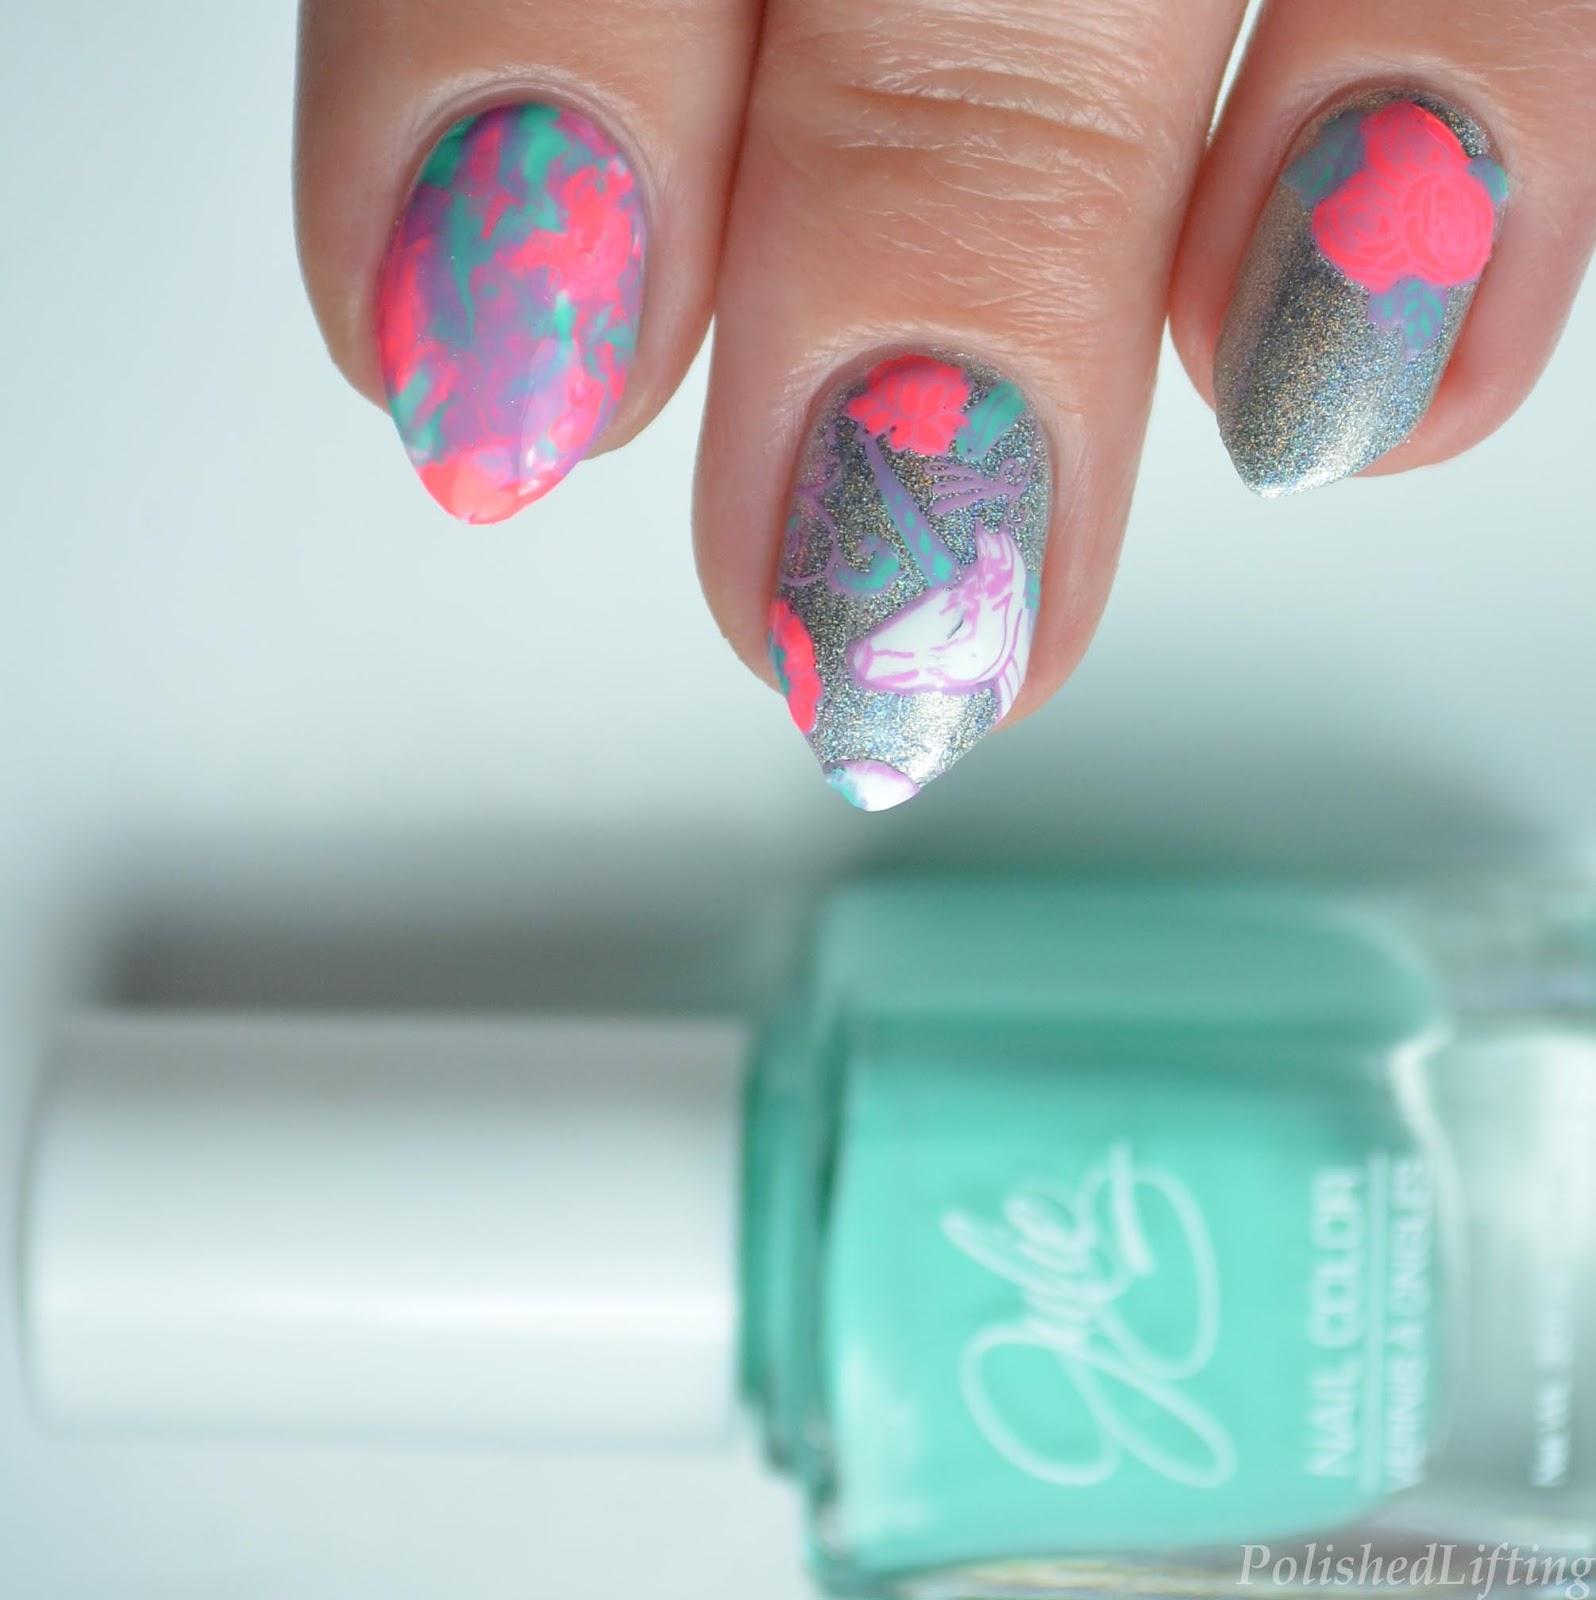 Polished Lifting: Neon Unicorn Stamping featuring Harunouta & JulieG